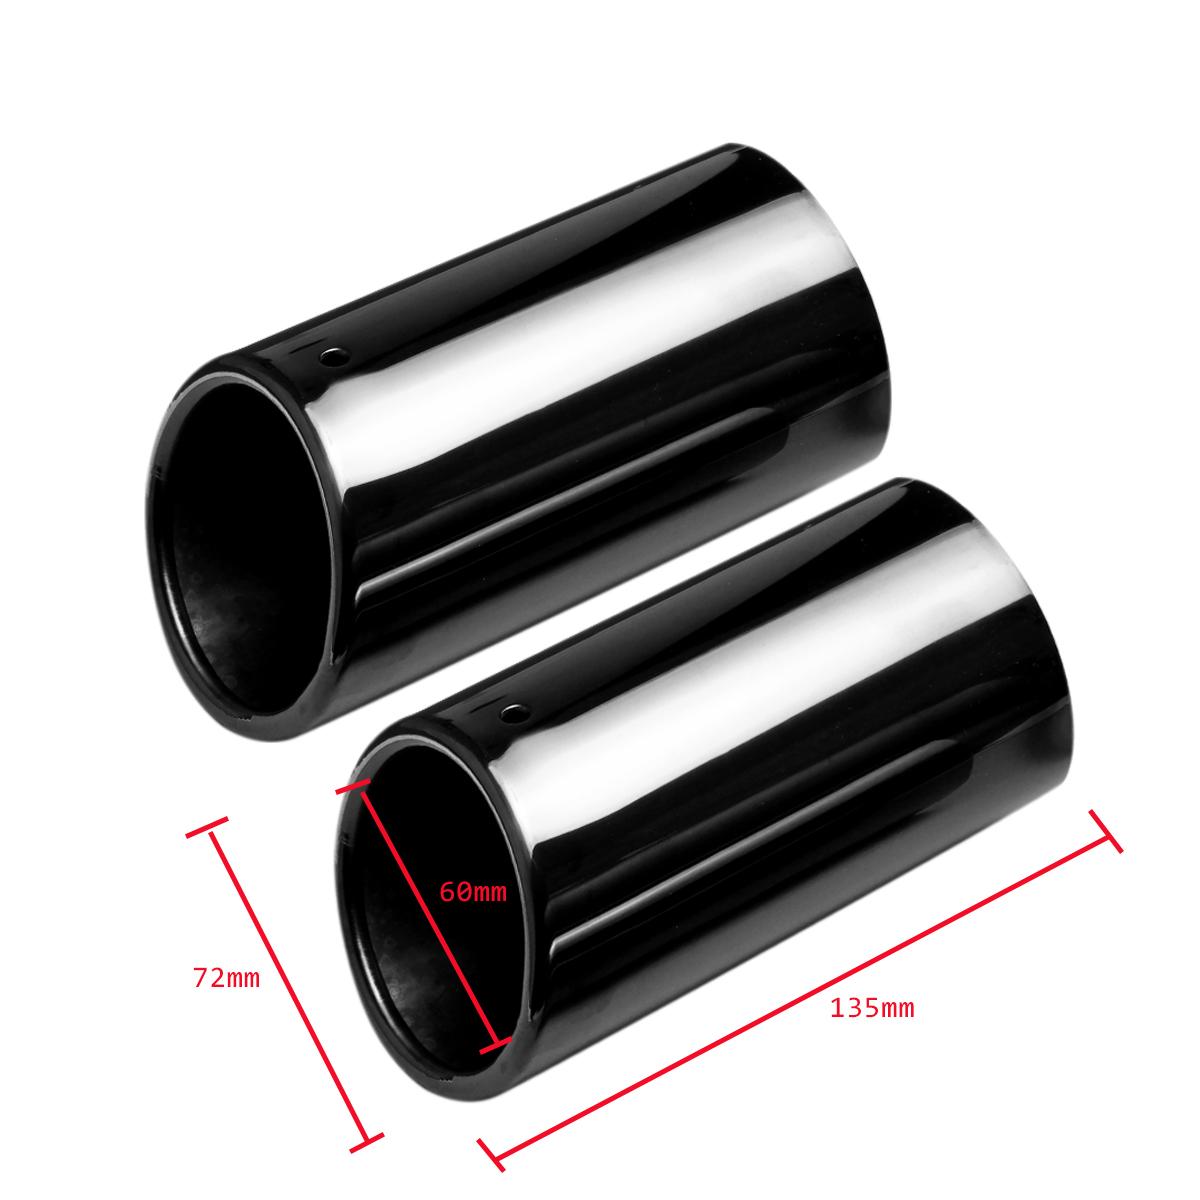 2x tail exhaust tip pipes titanium